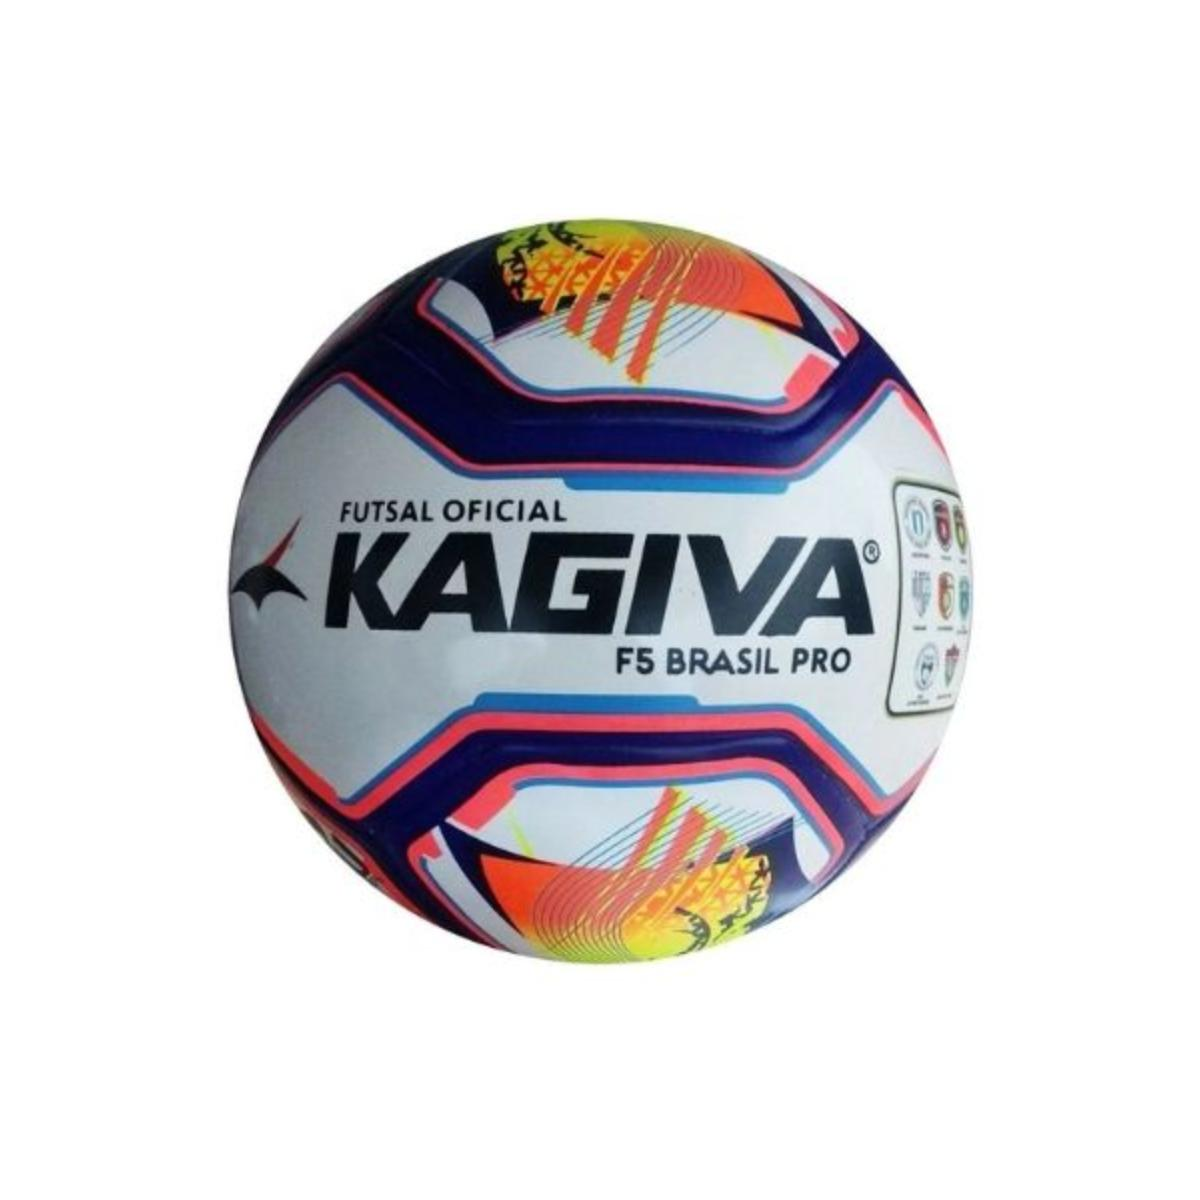 Unisex Kagiva 0089 Bola Futsal f5 Brasil Rosa Neon/azul/preto